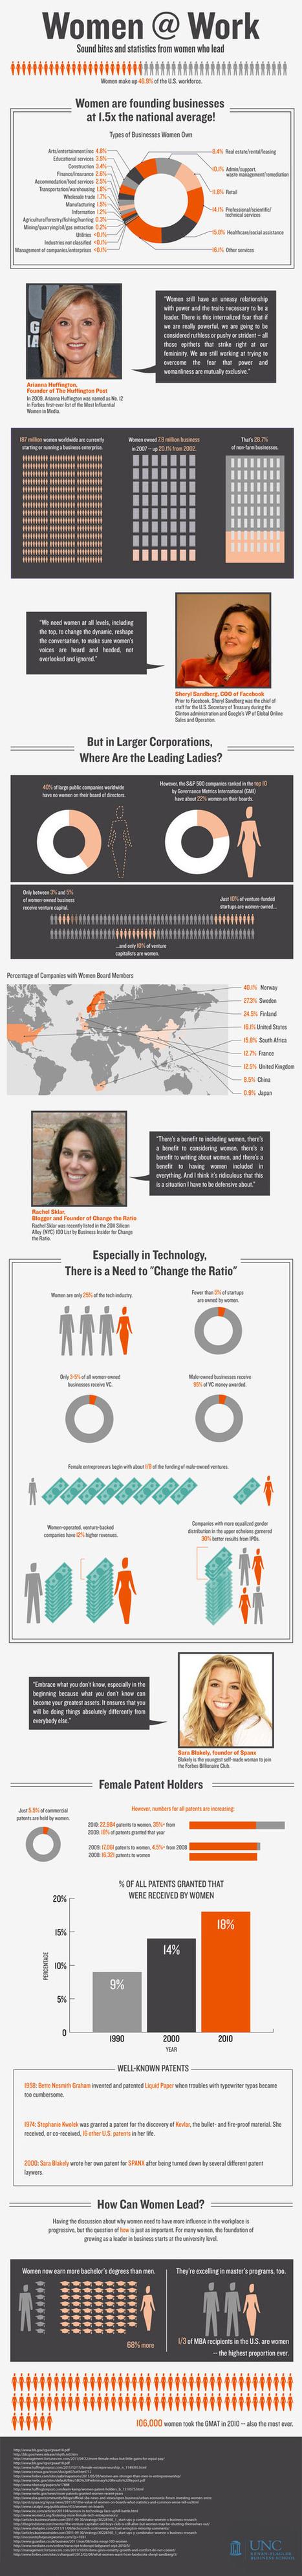 Women @ Work(Infographic) | TalentCircles | Scoop.it